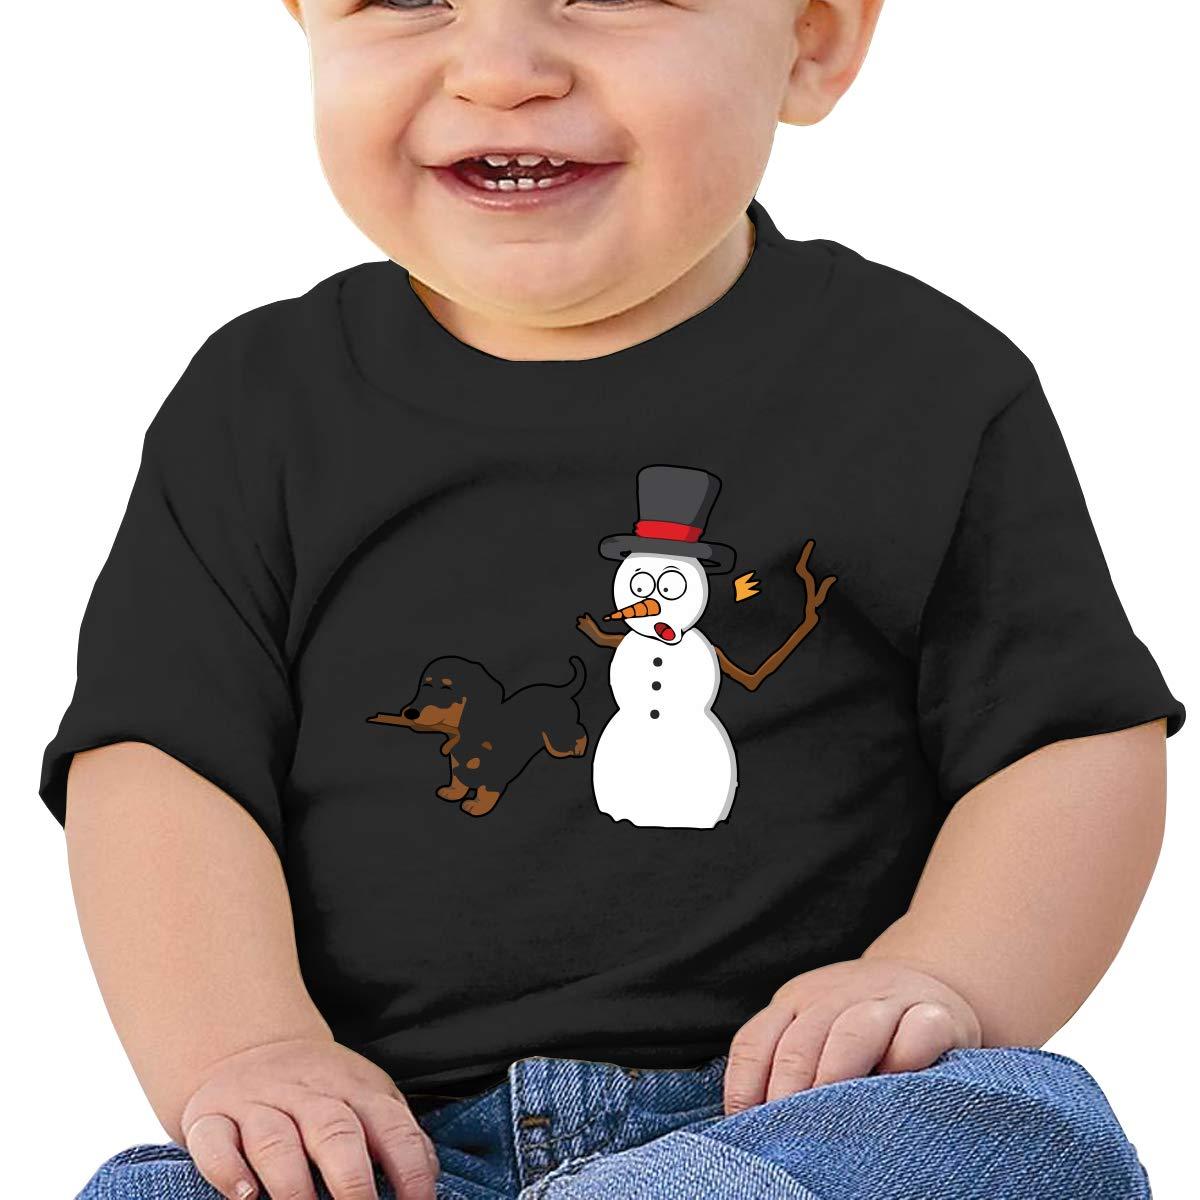 Dachshund Snowman Stick Arm Christmas Newborn Baby Newborn Short Sleeve T-Shirt 6-24 Month Cotton Tops